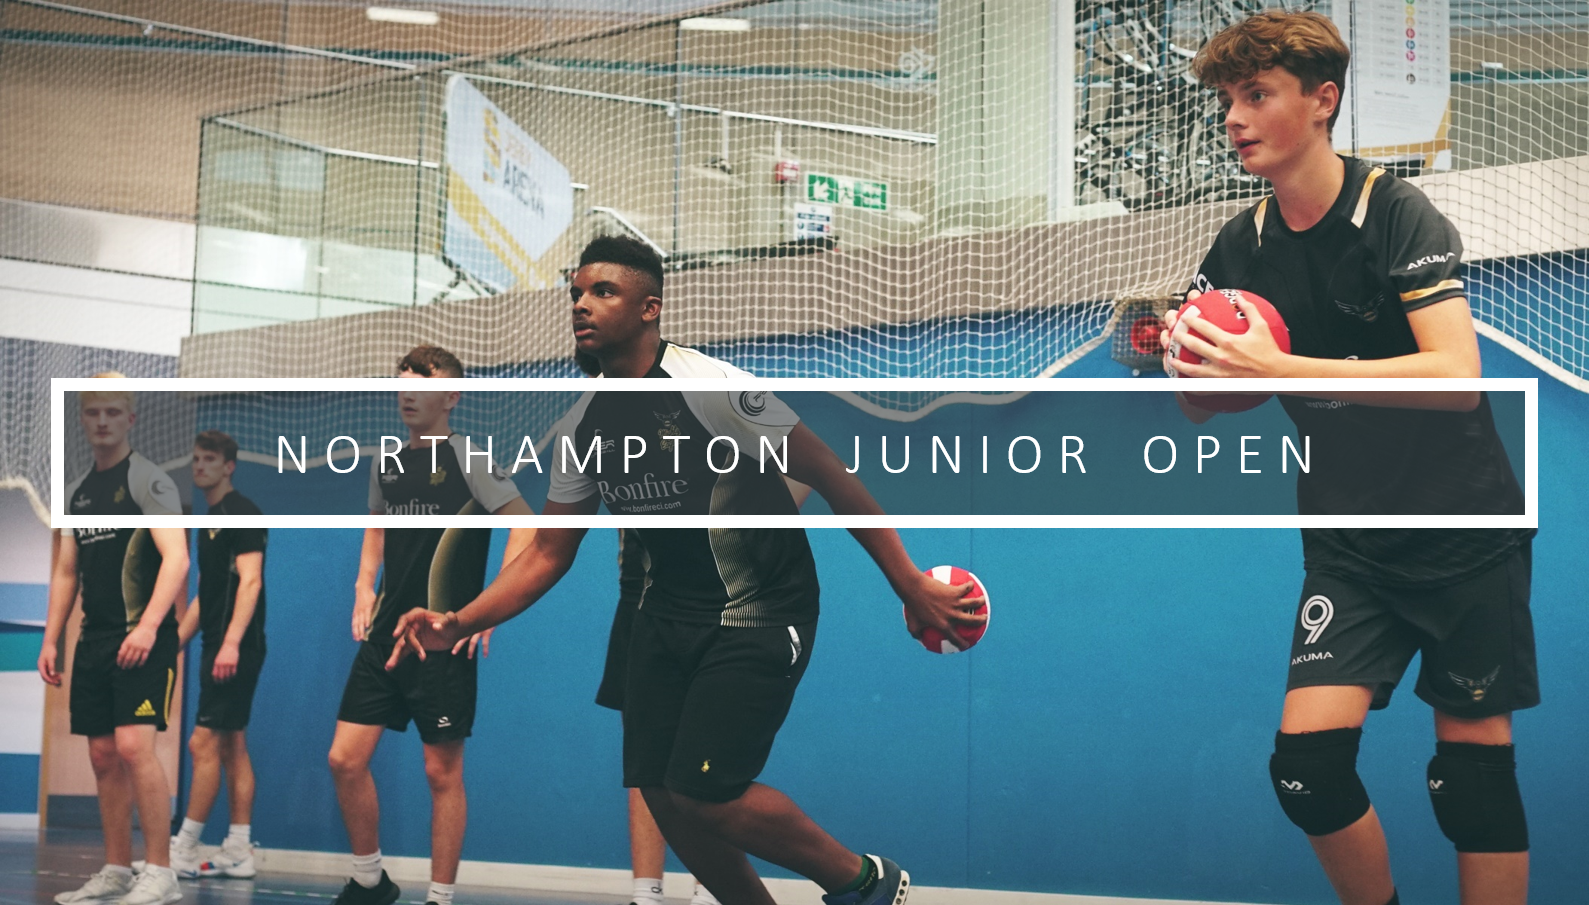 Northampton Juniors